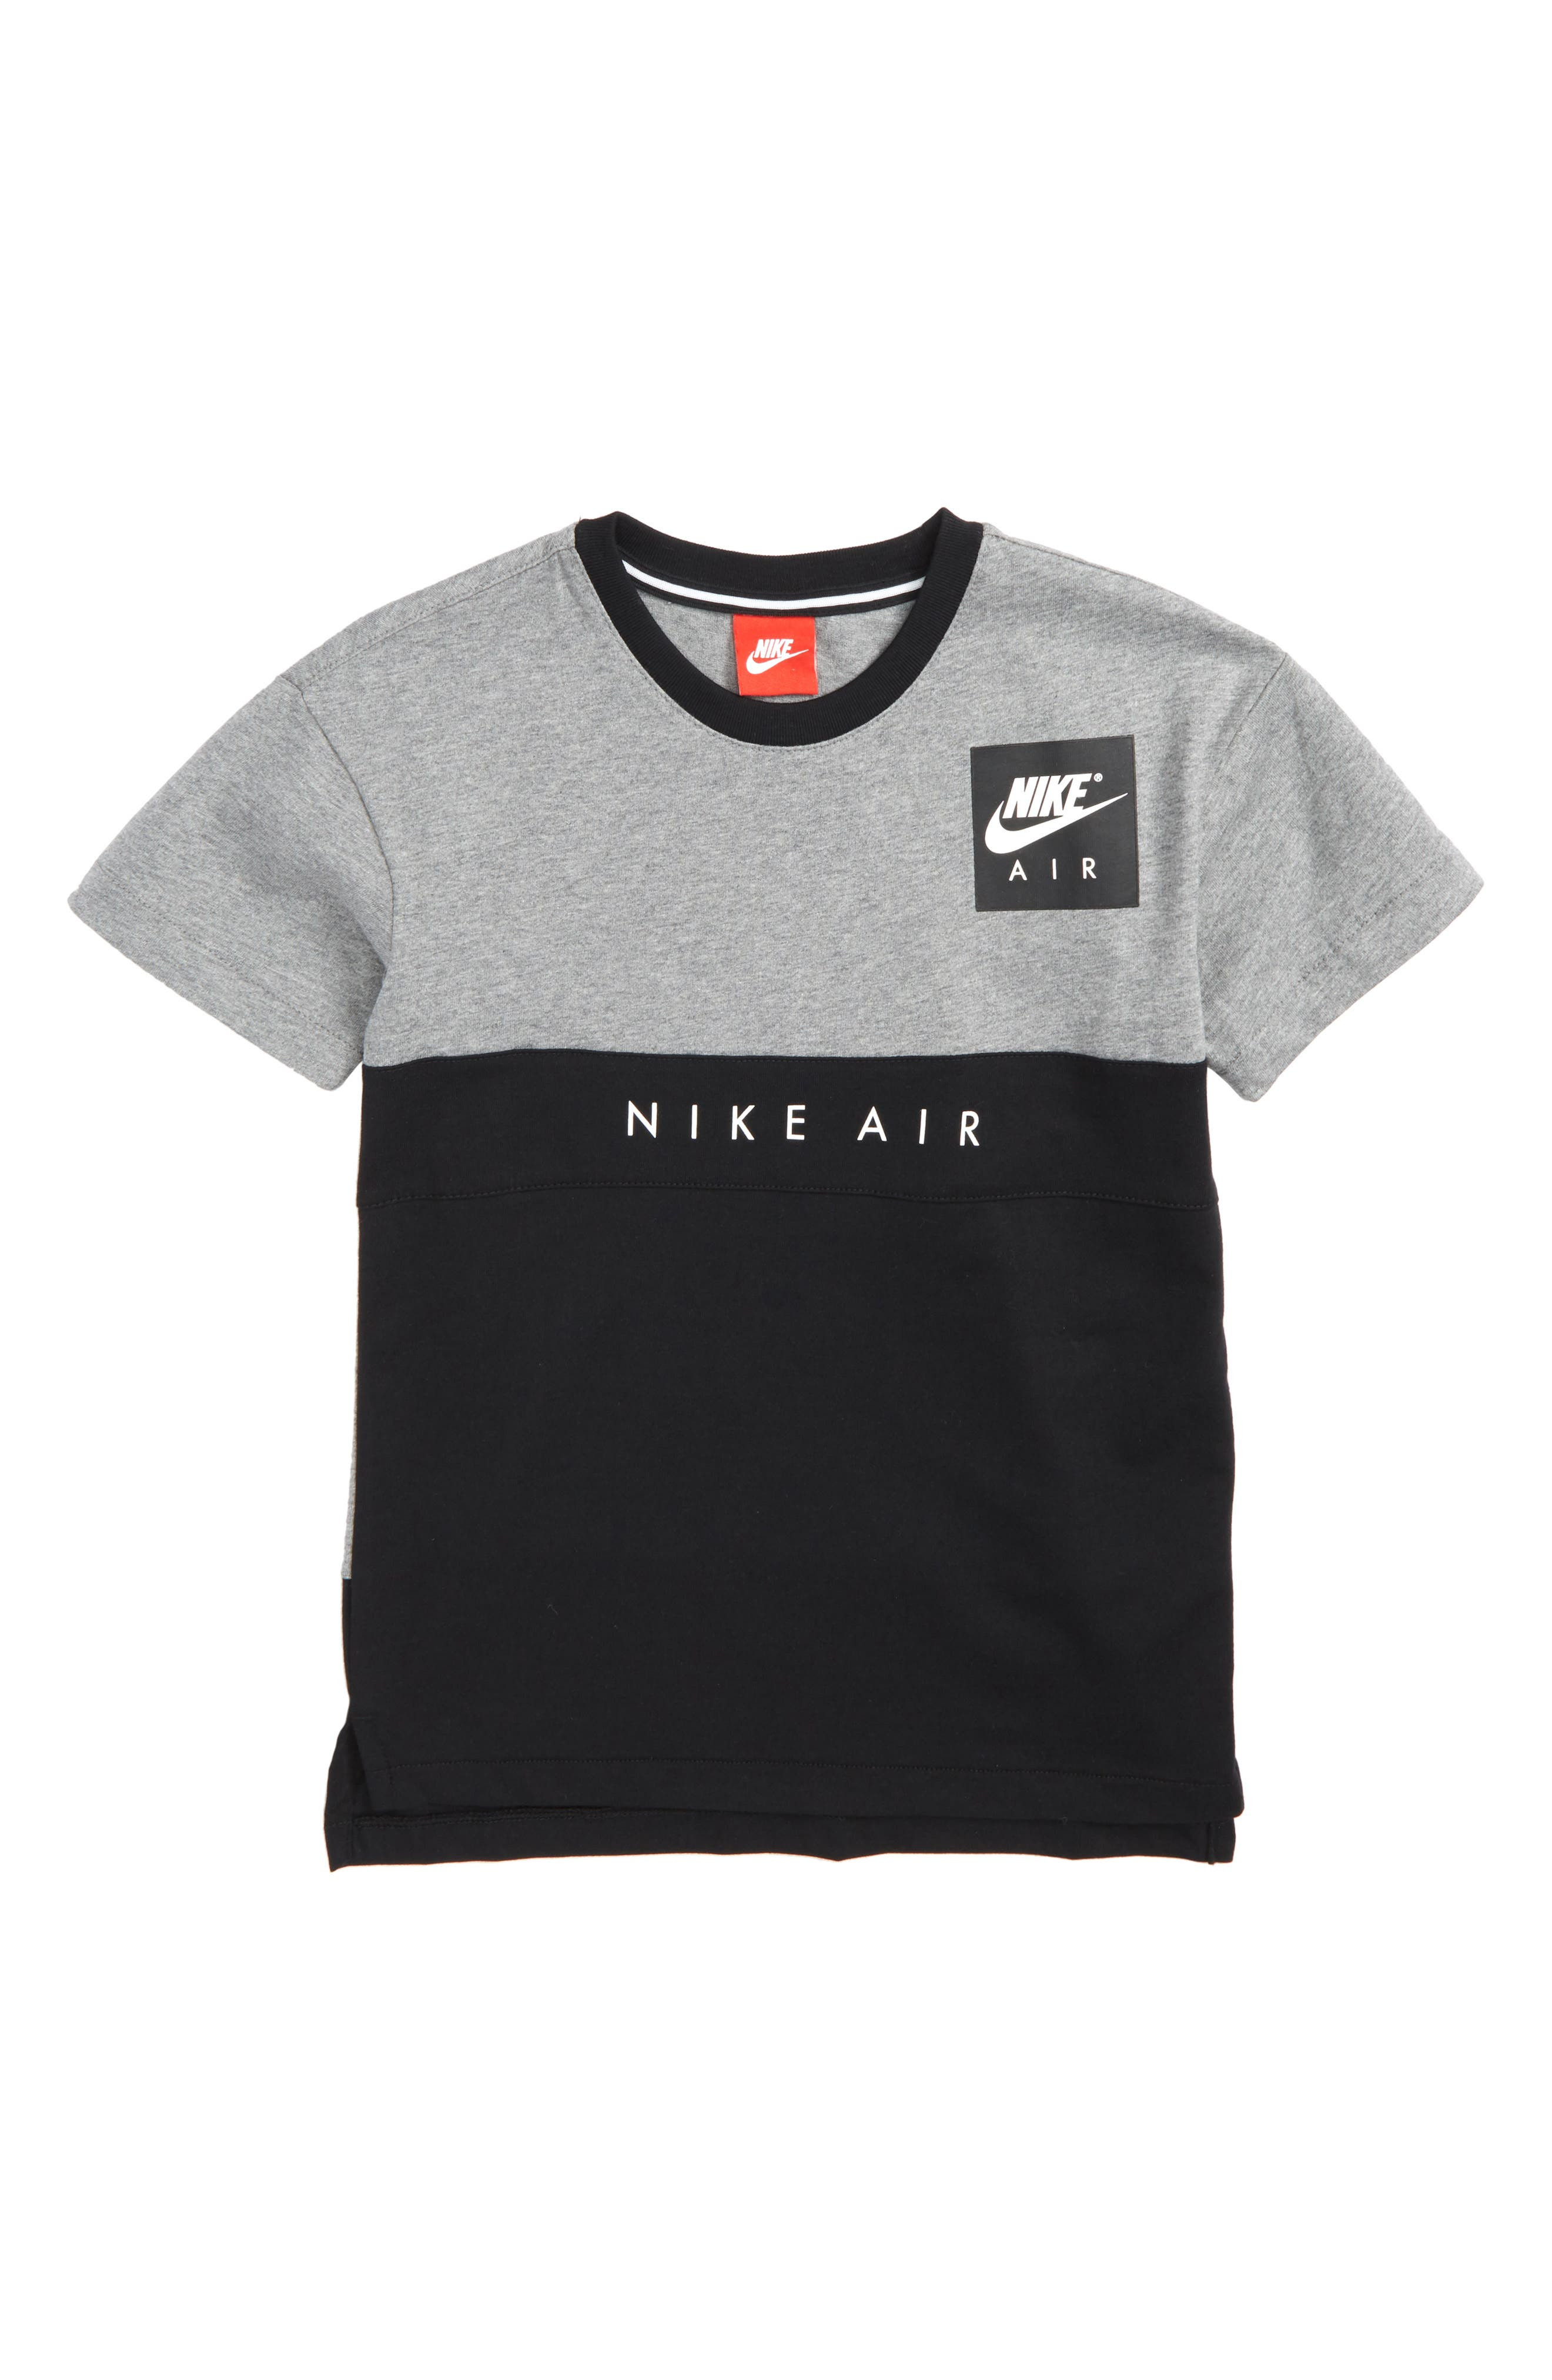 Air Shirt,                         Main,                         color, Carbon Heather/ Black